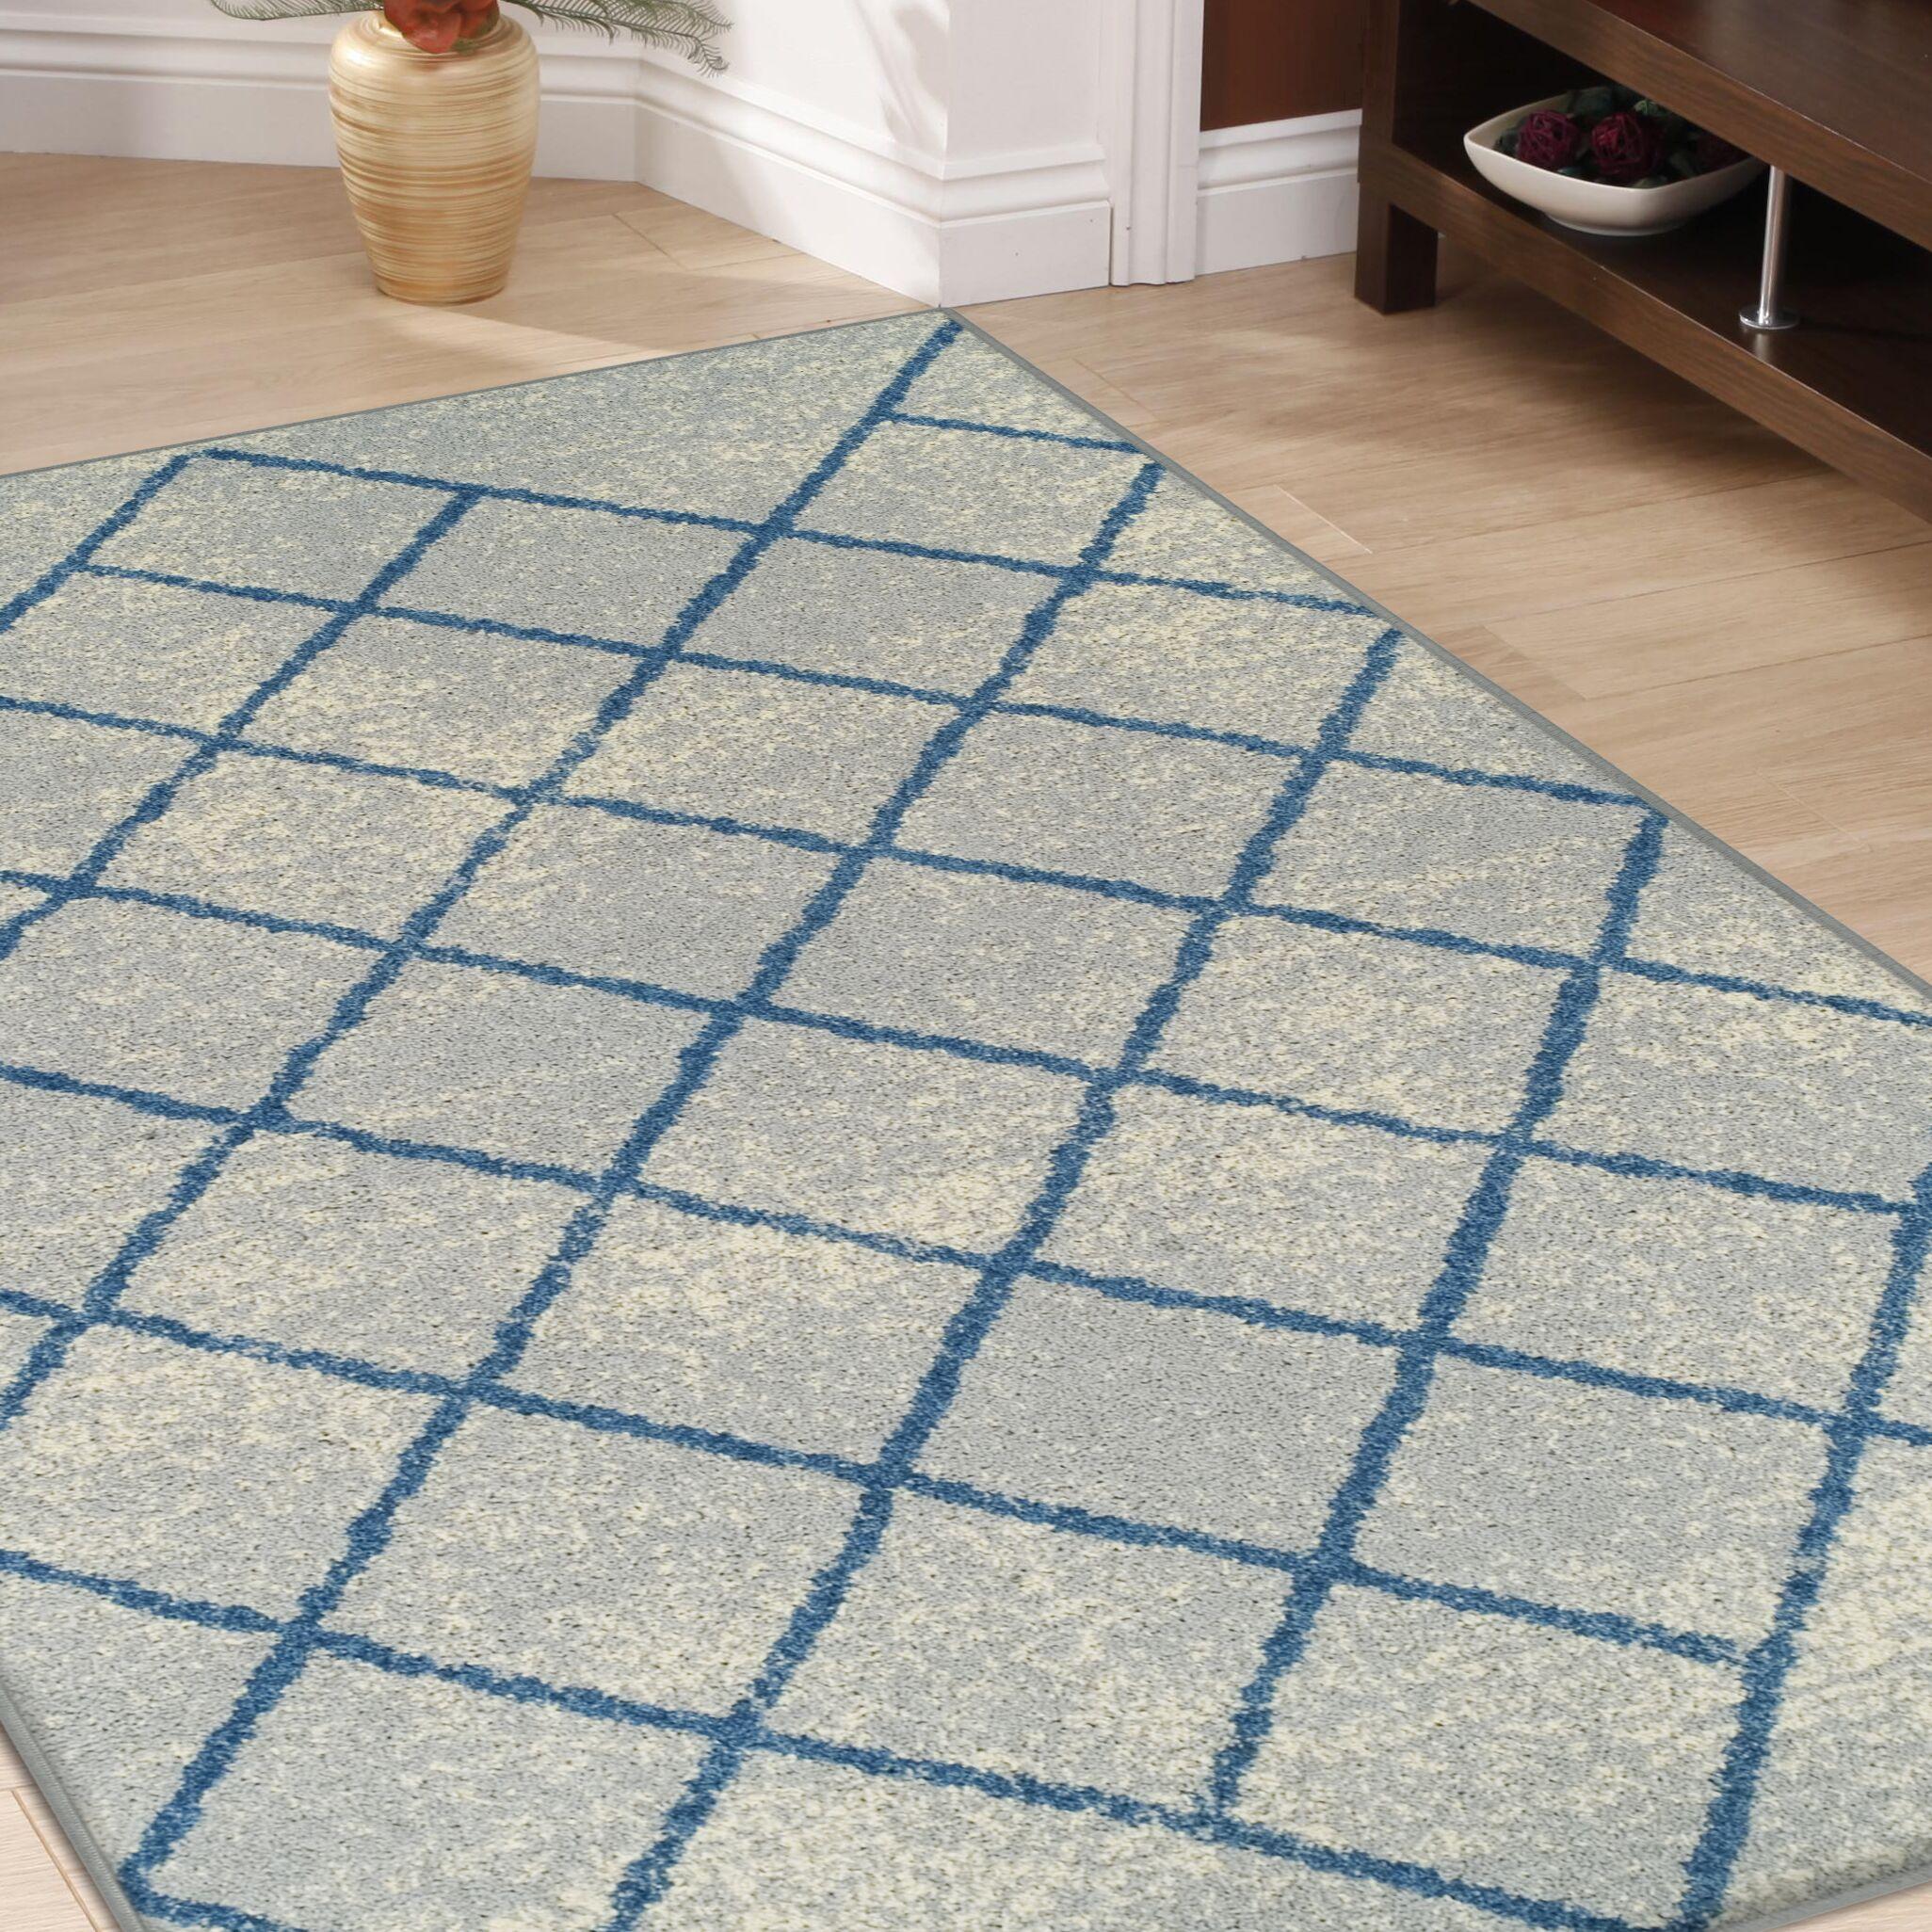 Verity Lattice Gray Area Rug Rug Size: Rectangle 8' x 10'